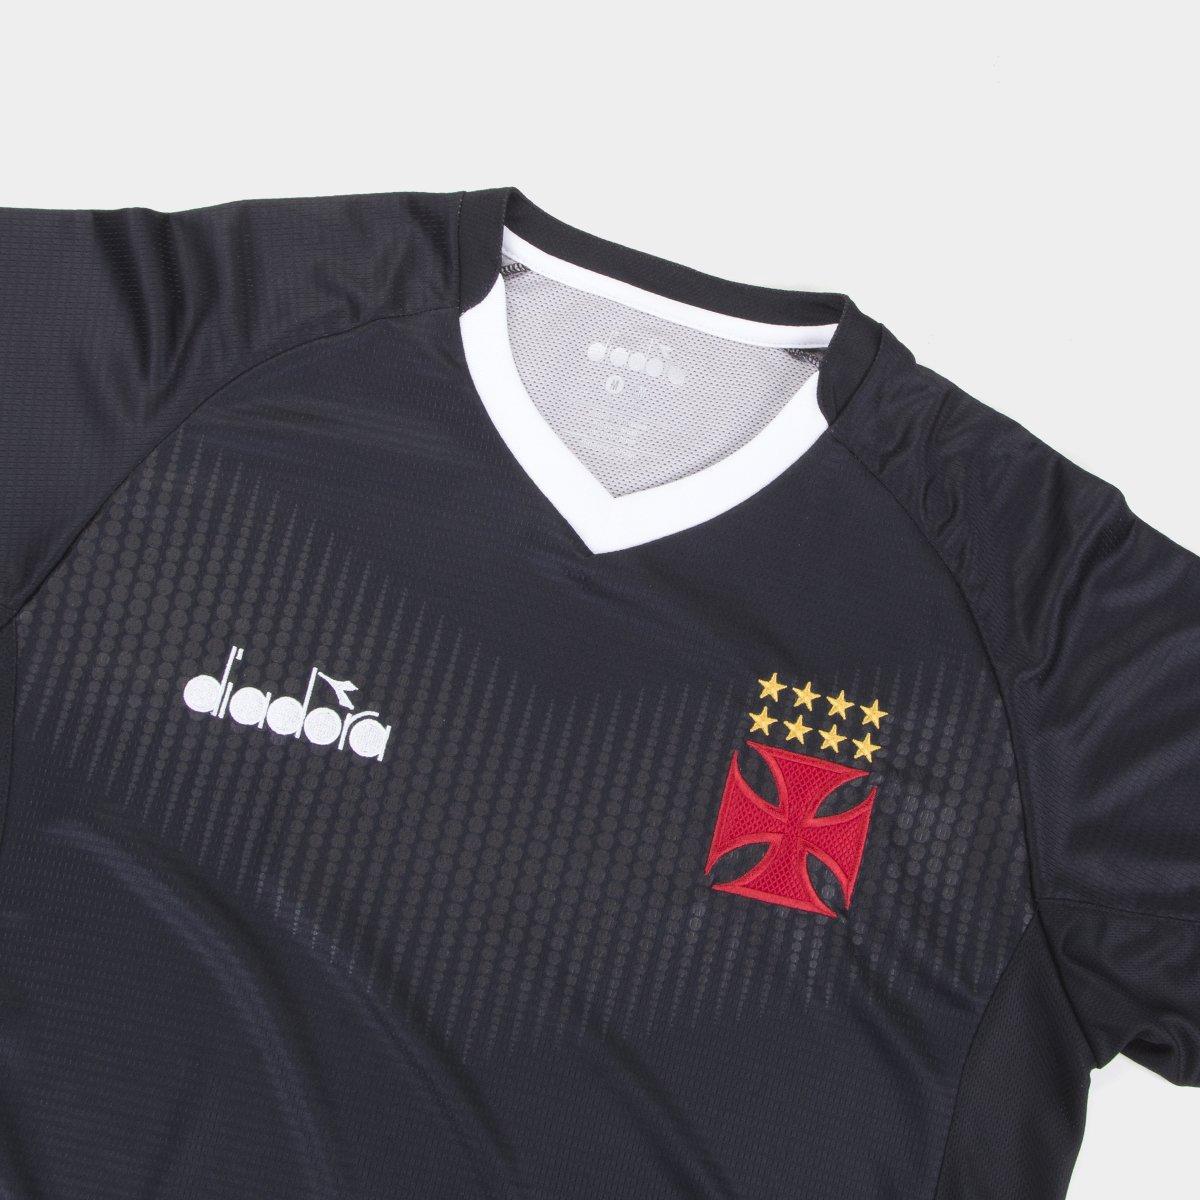 Camisa de Goleiro Vasco III 2018 s n° Torcedor Diadora Masculina ... 76f716c0ac3e8